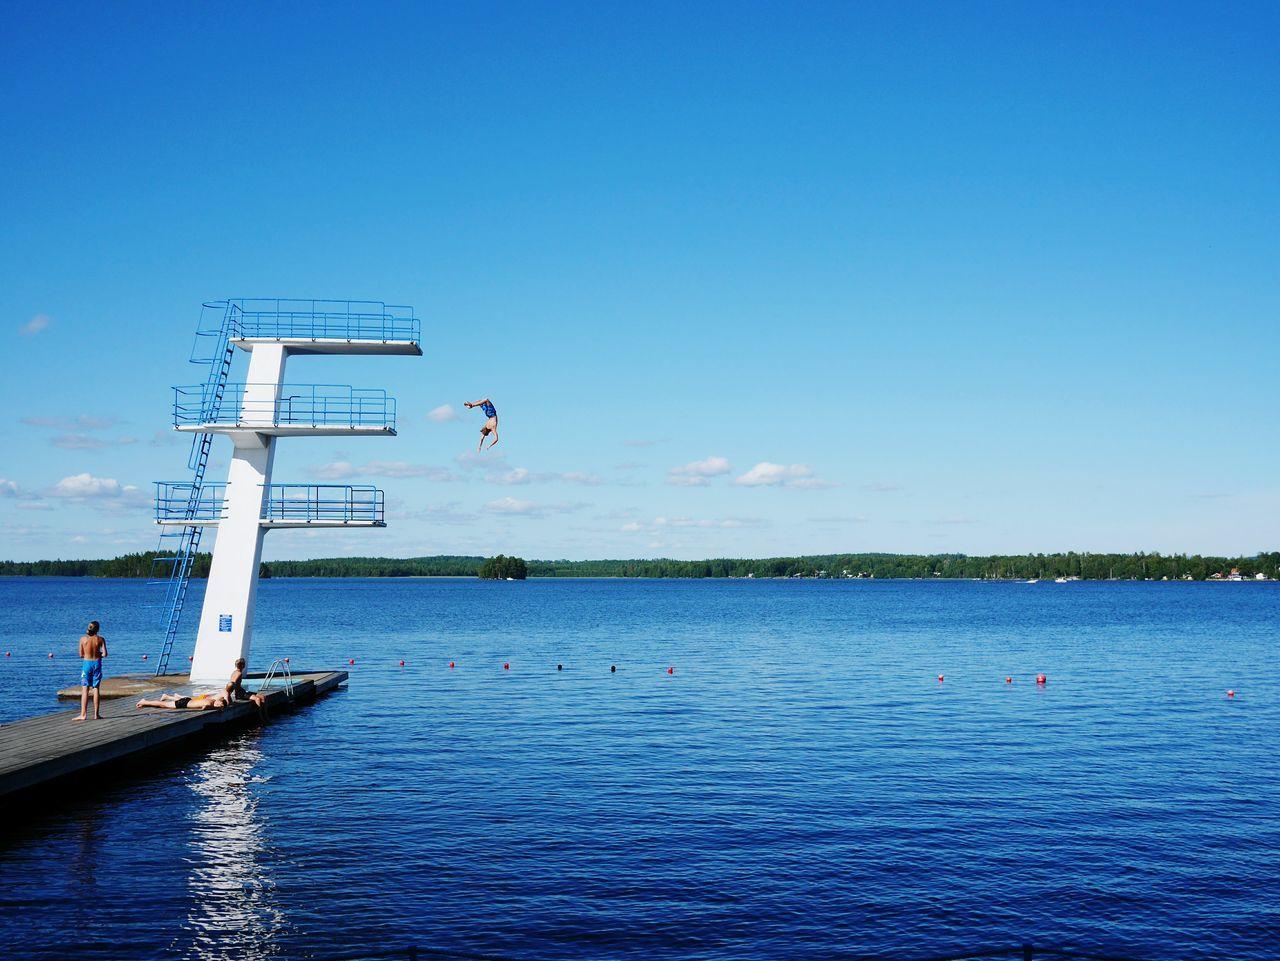 Man diving off high platform into lake